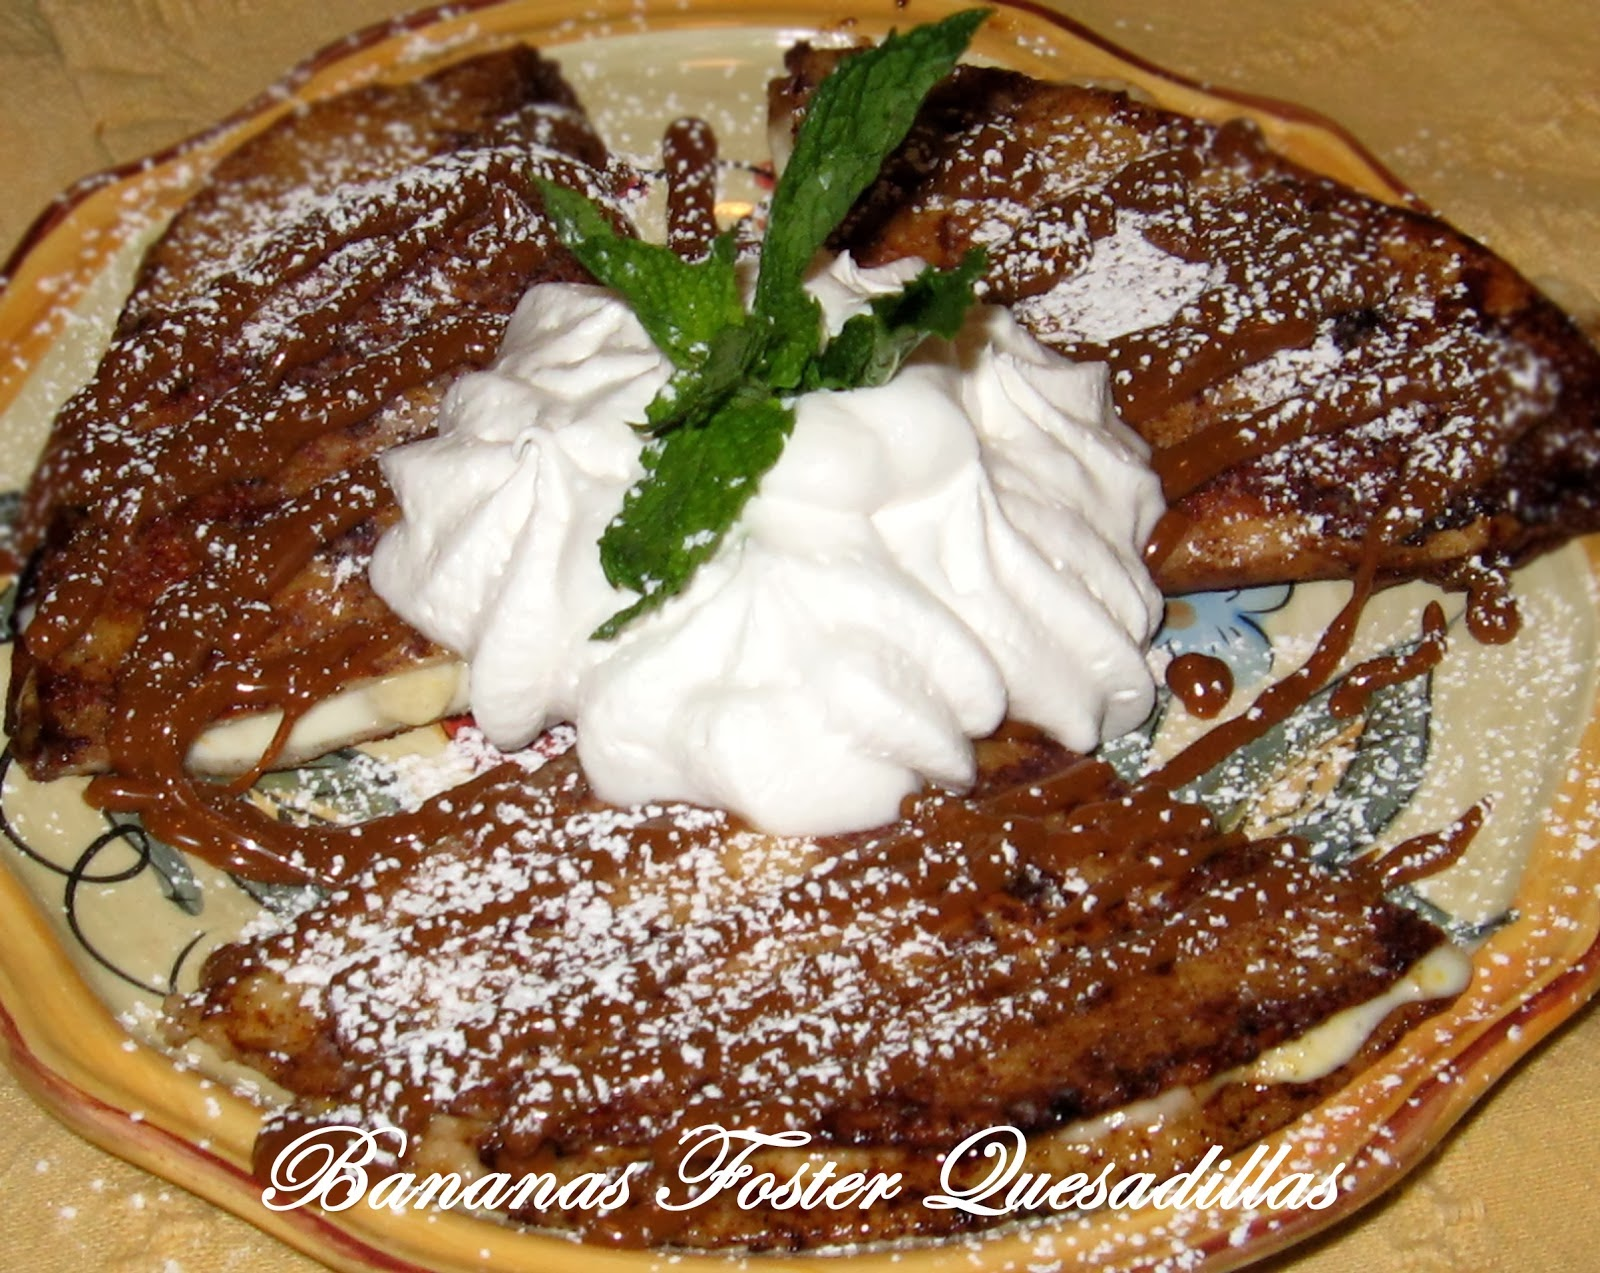 Bananas Foster Quesadilla Recipe image